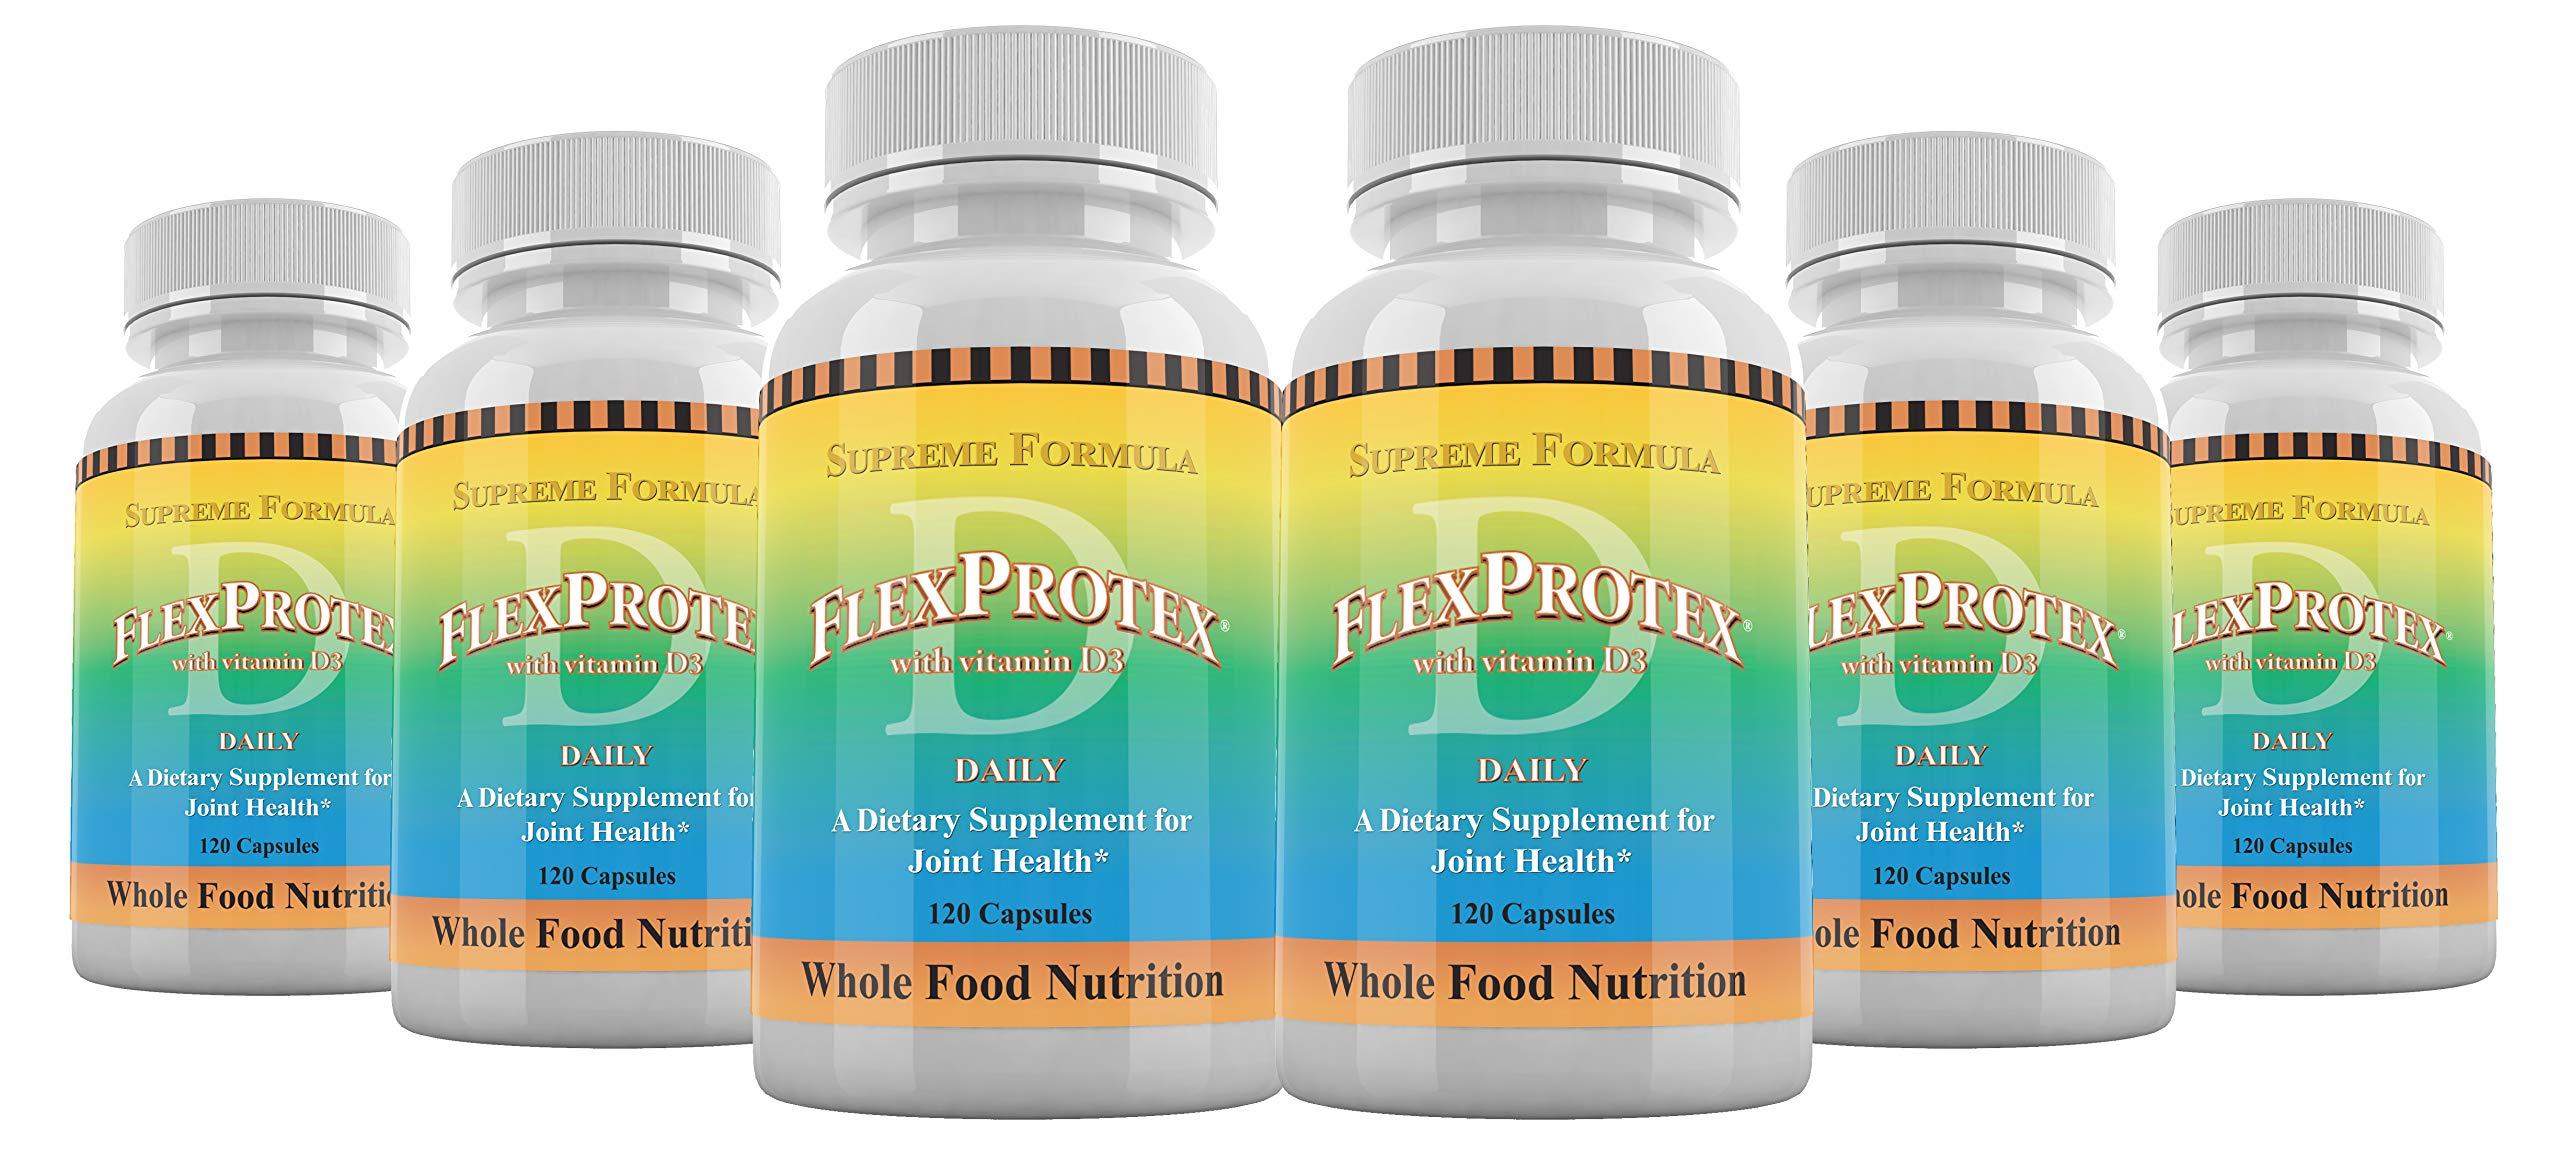 FlexProtex D Daily Vitamin D3 Plus 1 Plain Silver Foil Pack CoralCal Daily Calcium 6 Sachets Dietary Supplement (6 Bottle)